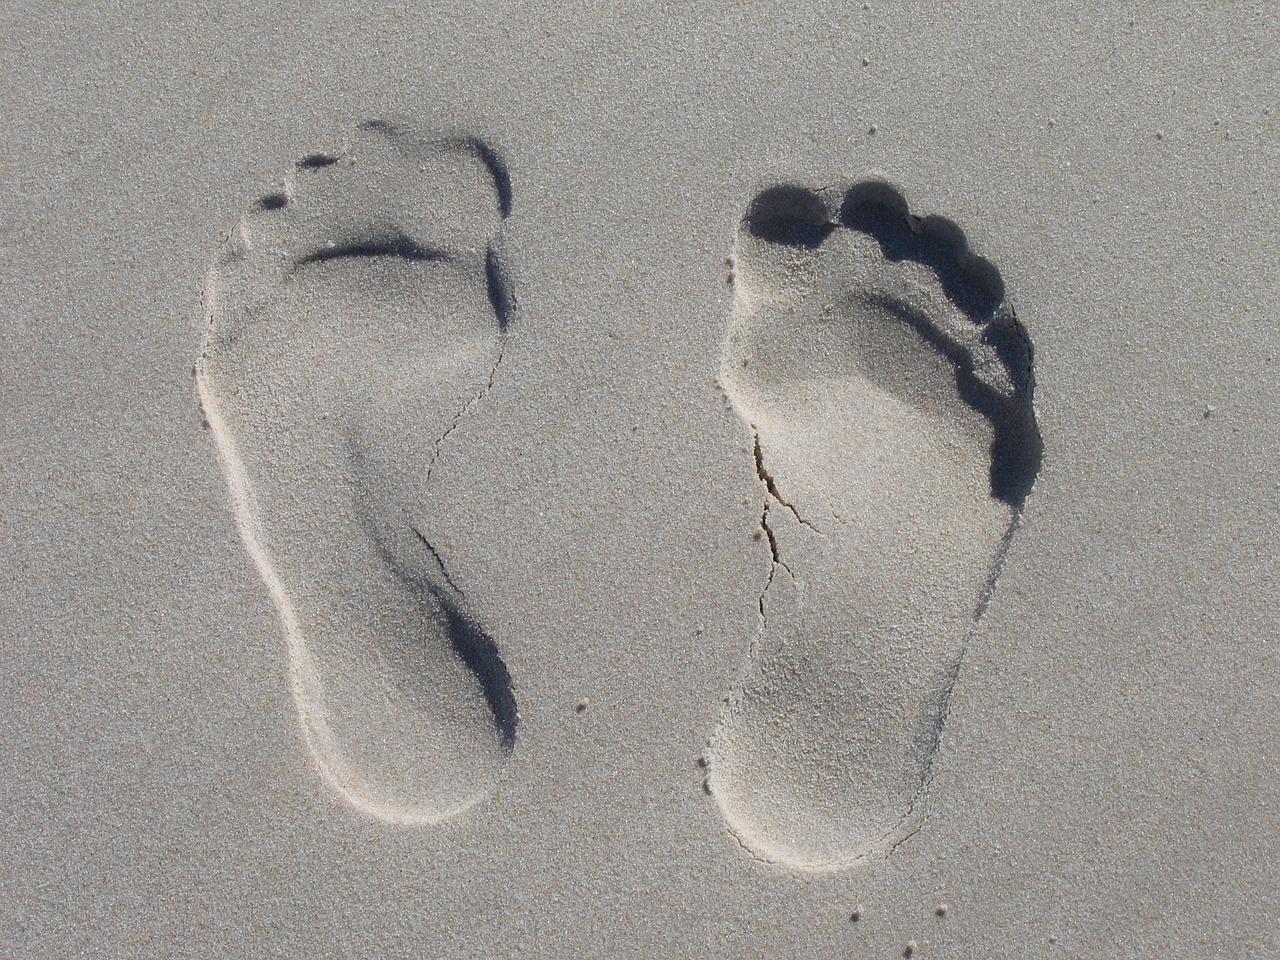 sand, reprint, feet